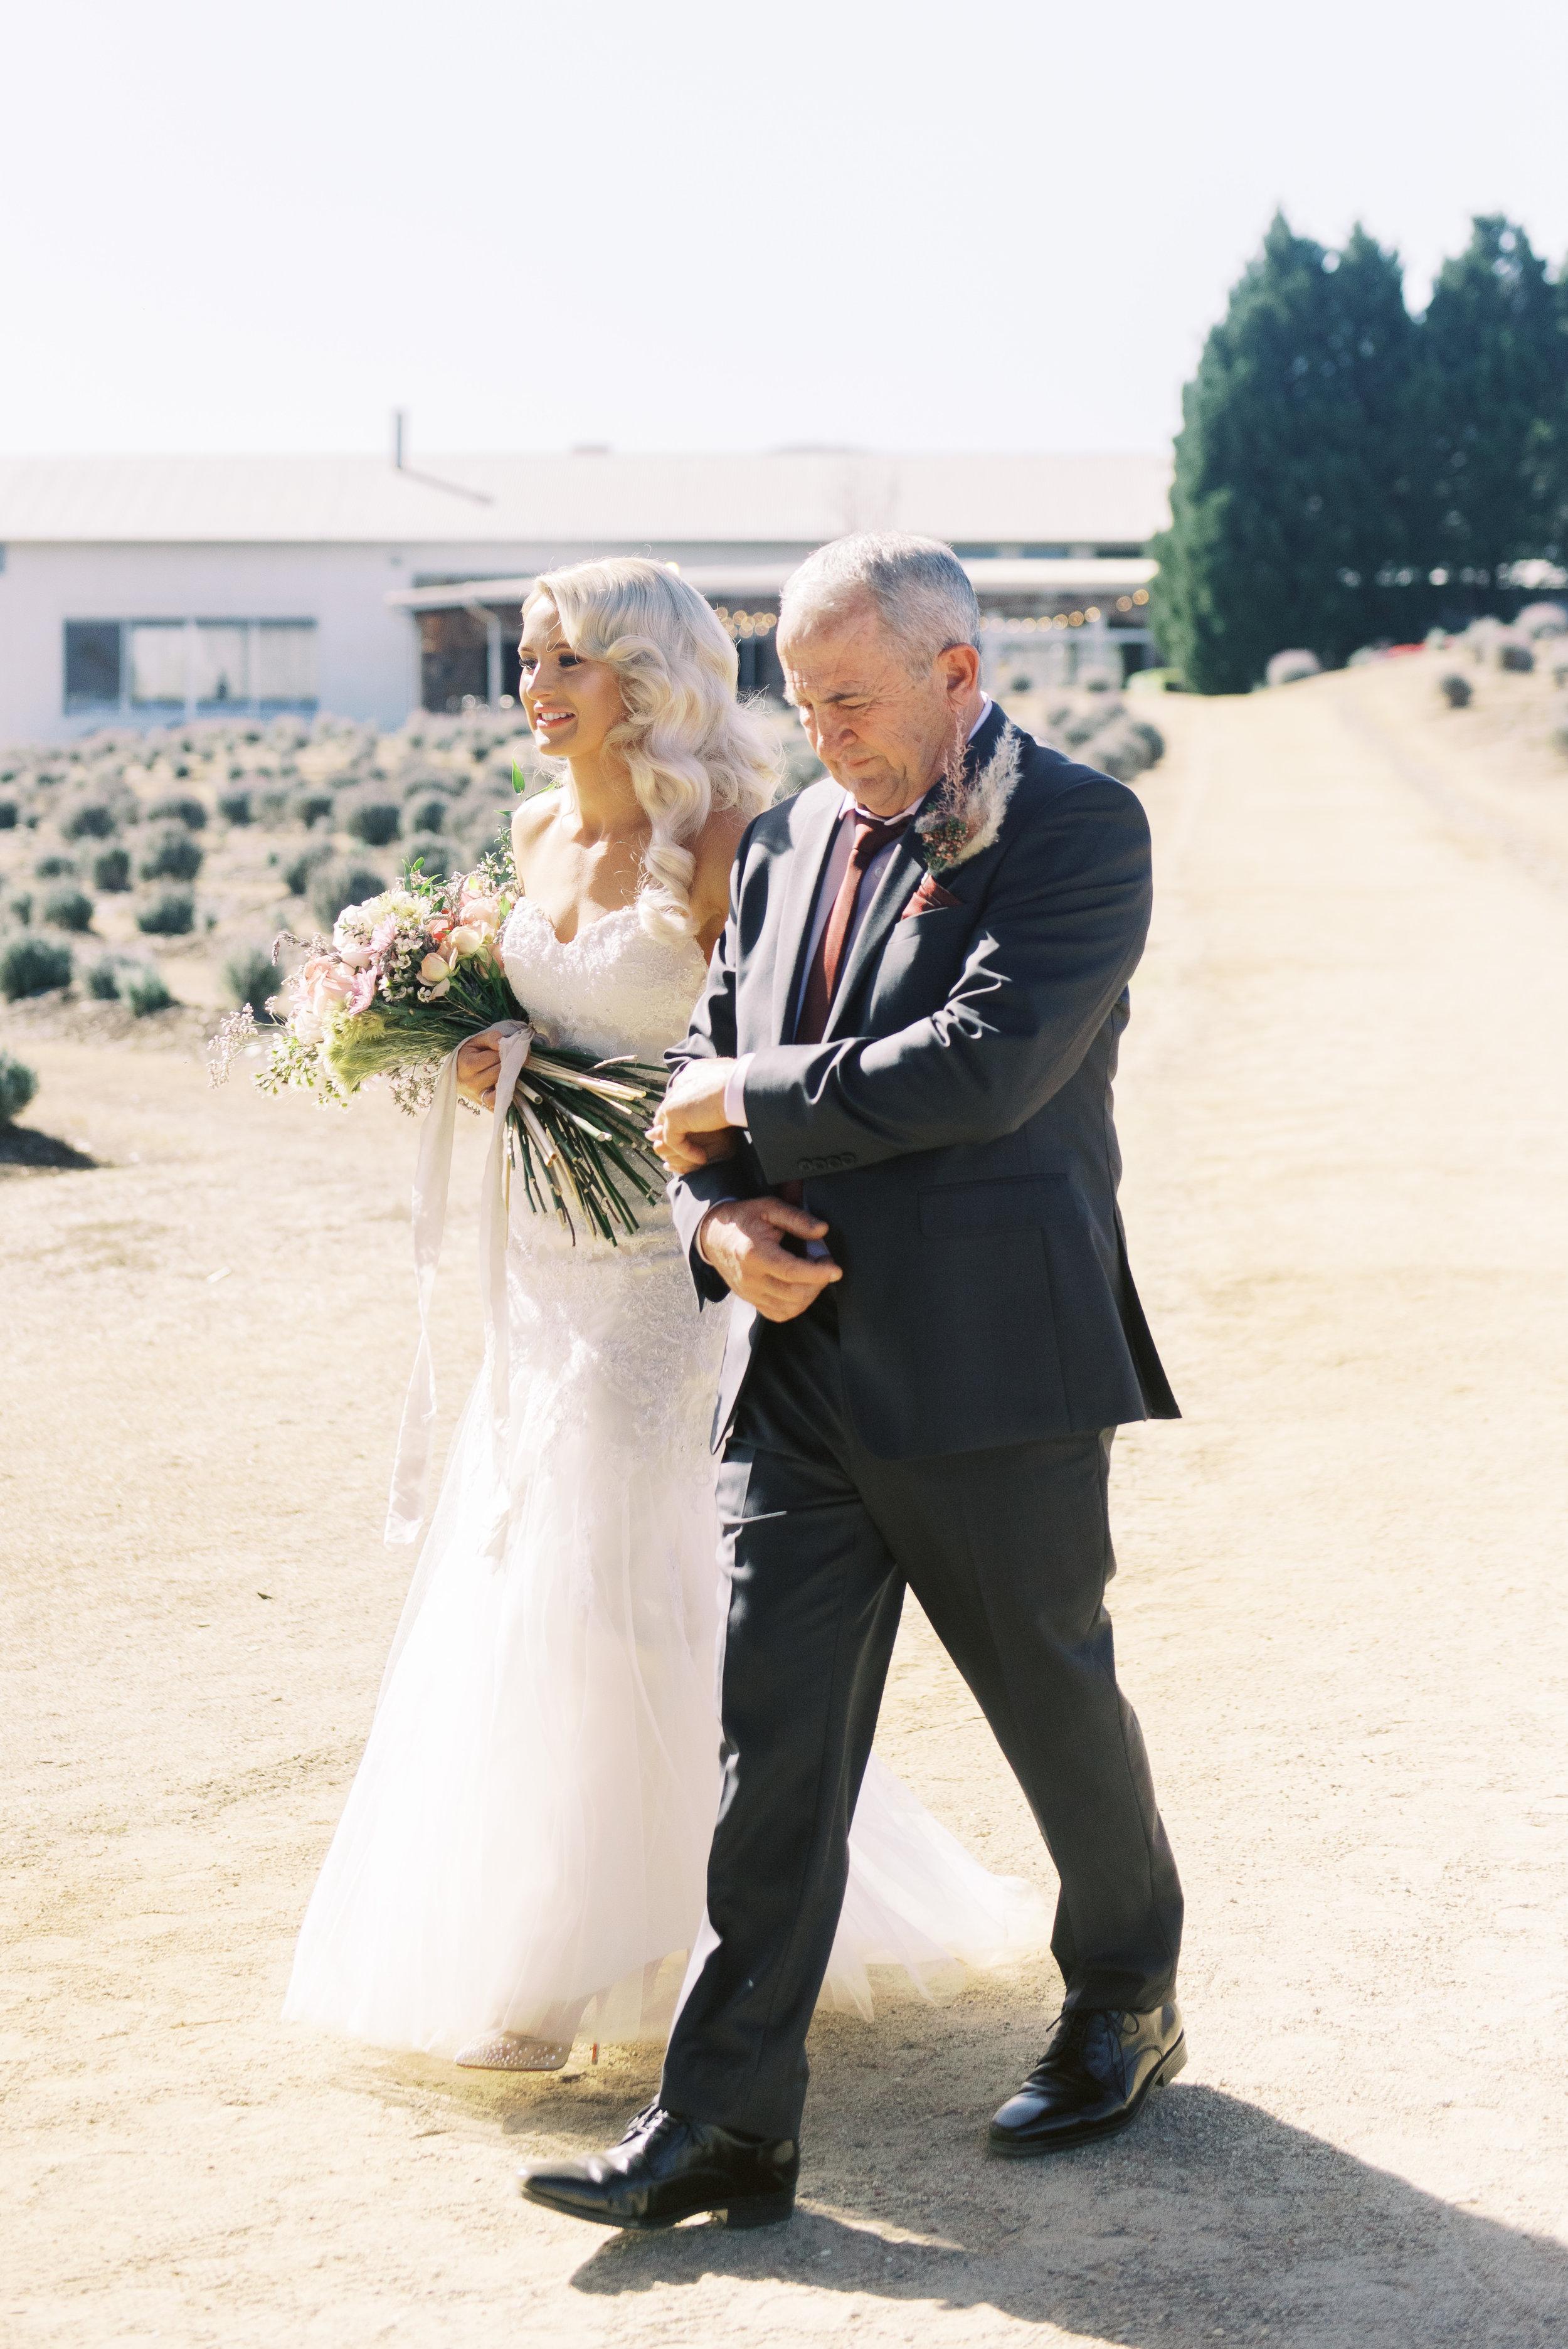 Kooroomba-Vineyard-Lavender-Farm-Wedding-Fine-Art-Lauren-Olivia-38.jpg